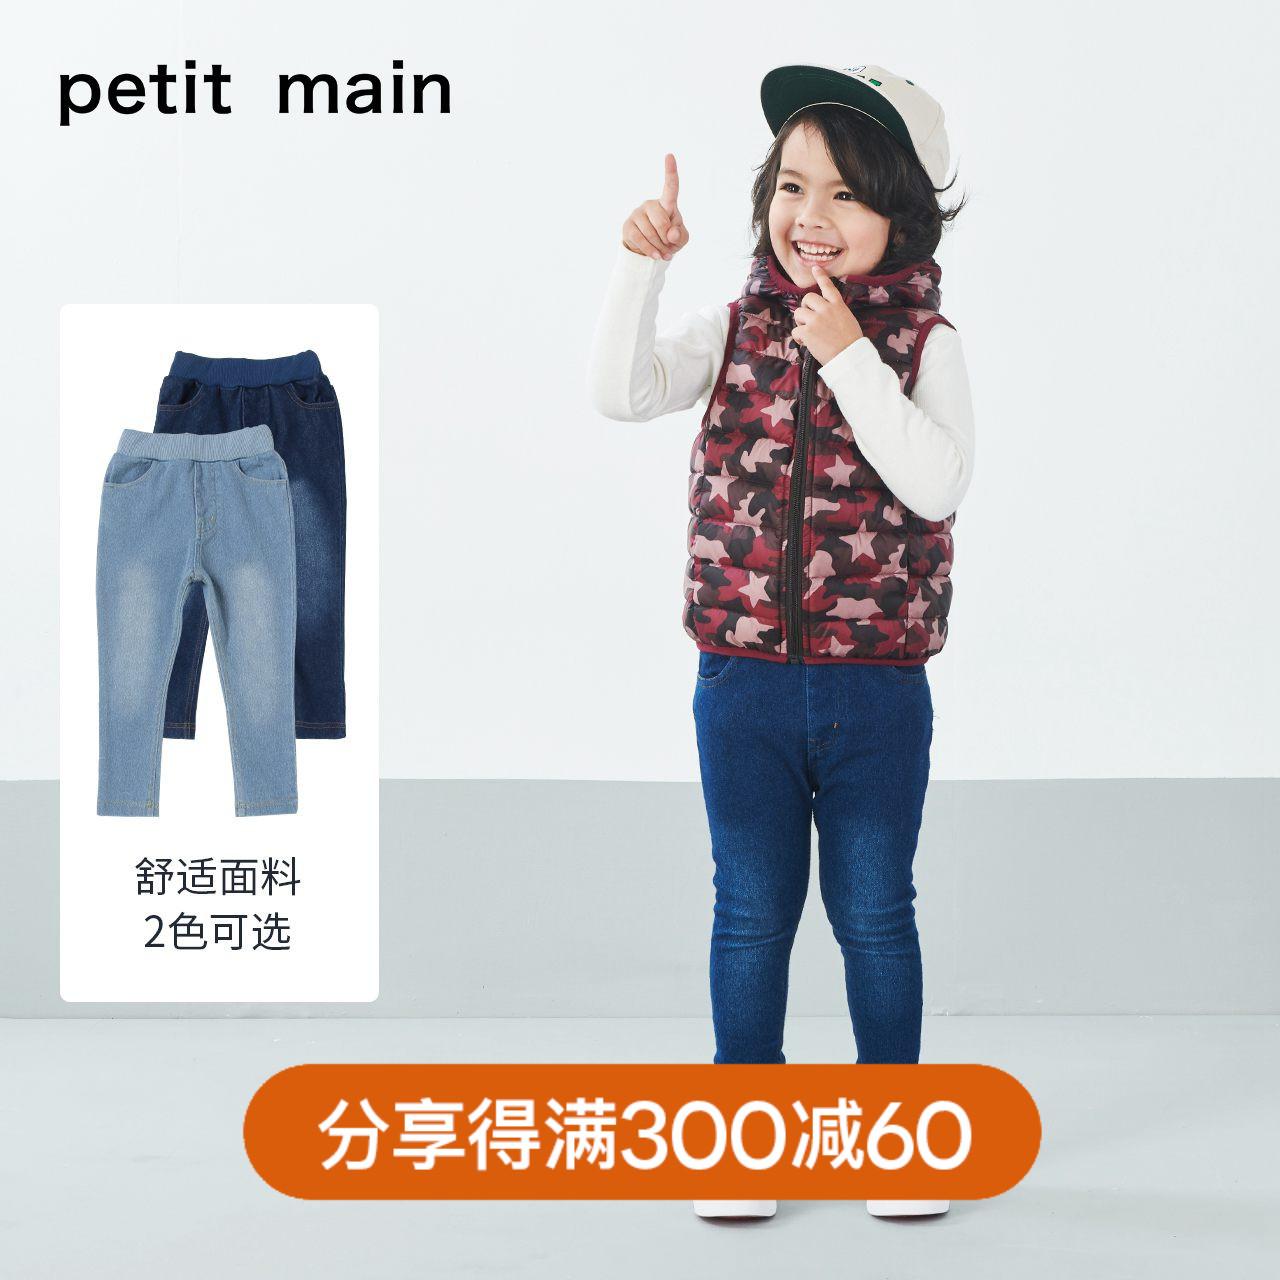 petitmain童装男女童宝宝牛仔裤修身时尚中腰牛仔长裤2019秋款